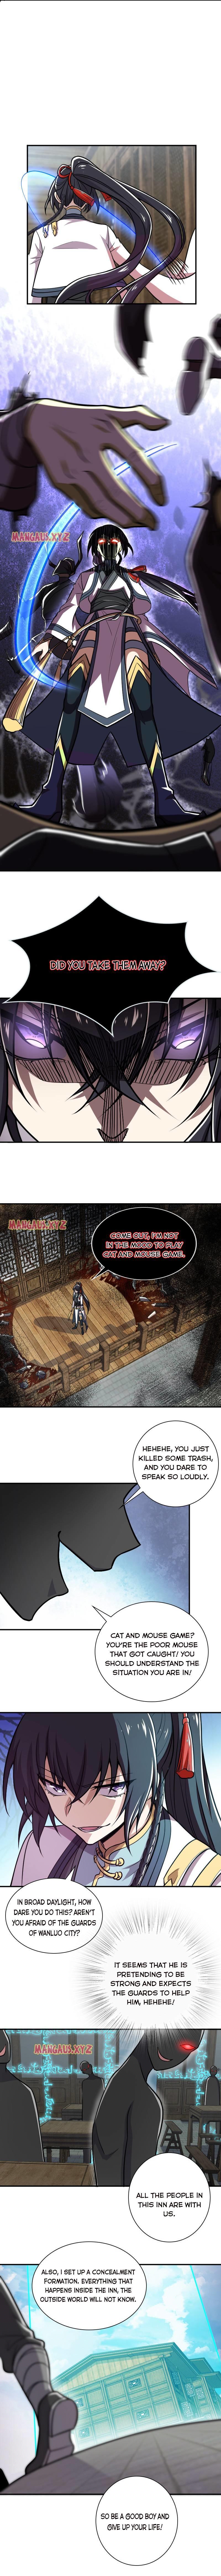 Life Of A War Emperor After Retirement Chapter 30 page 6 - Mangakakalots.com